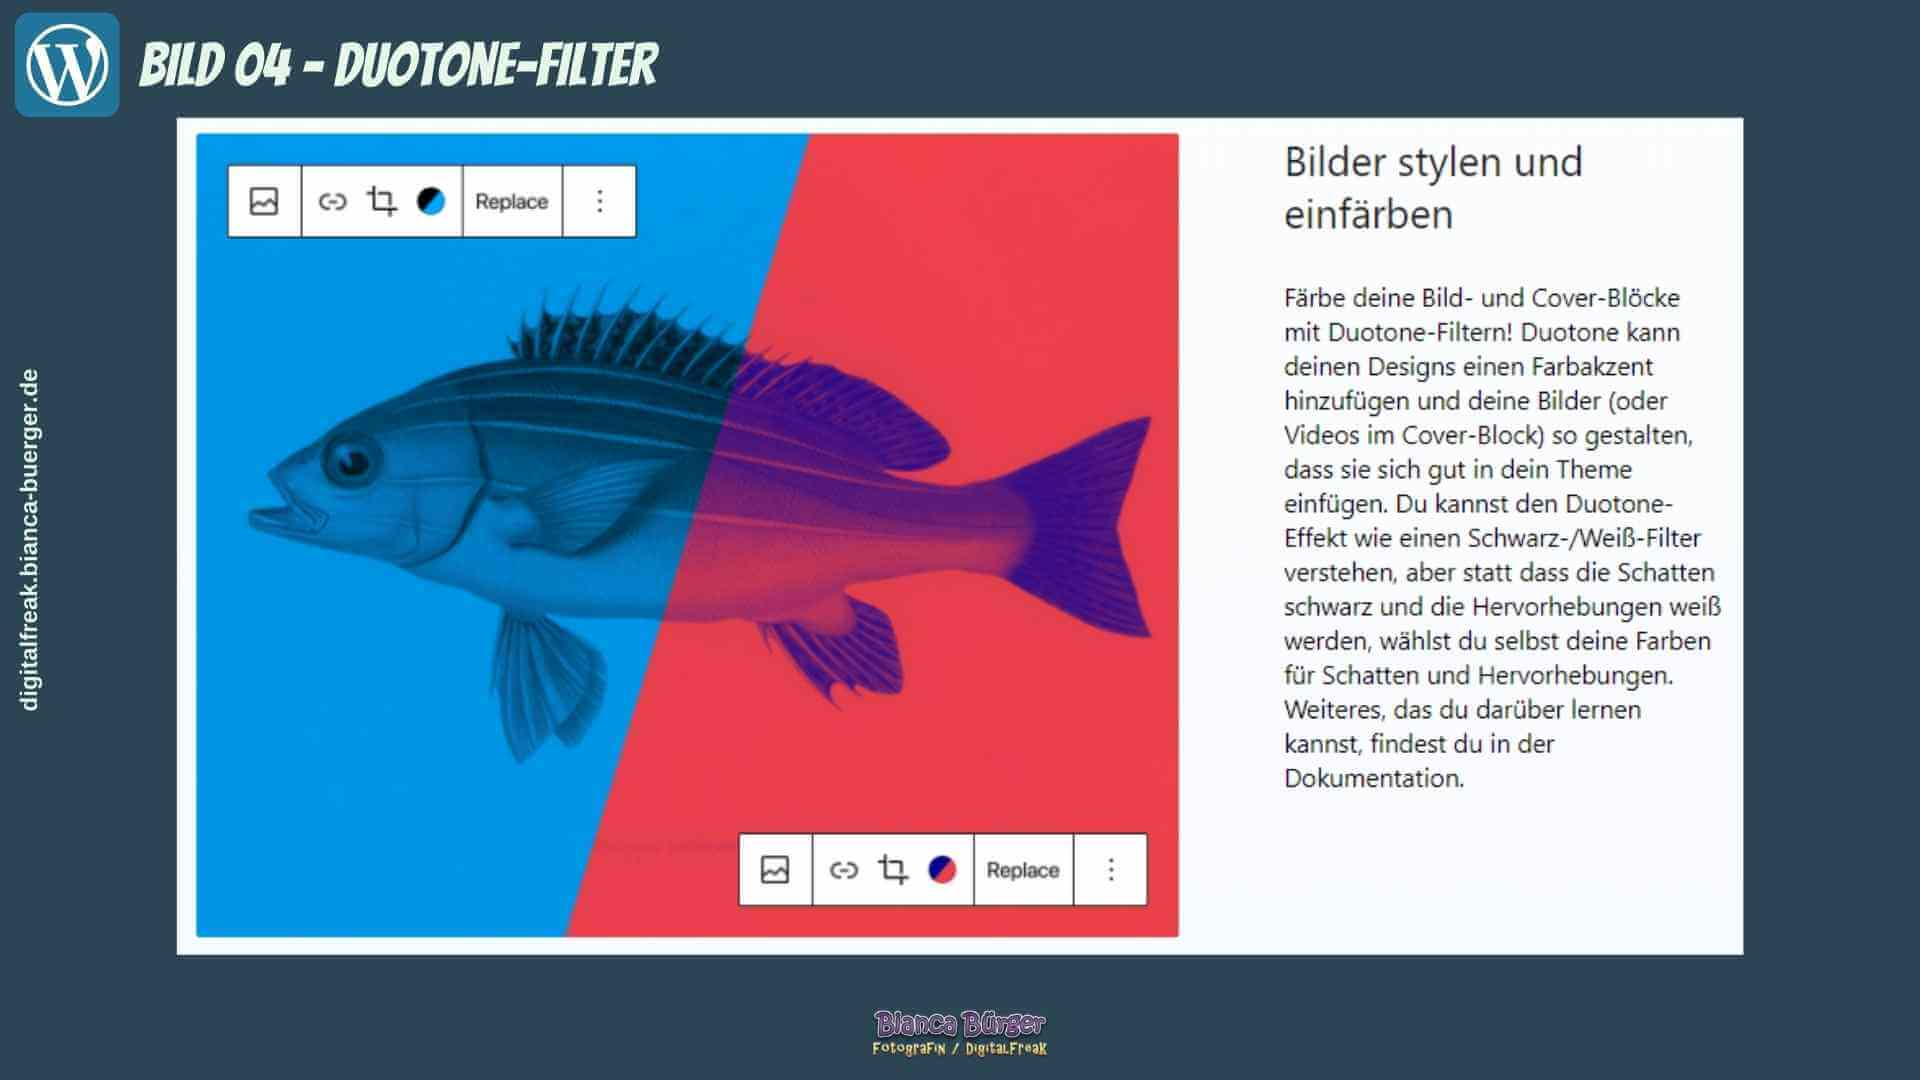 WordPress-5-8_04_Duotone-Filter